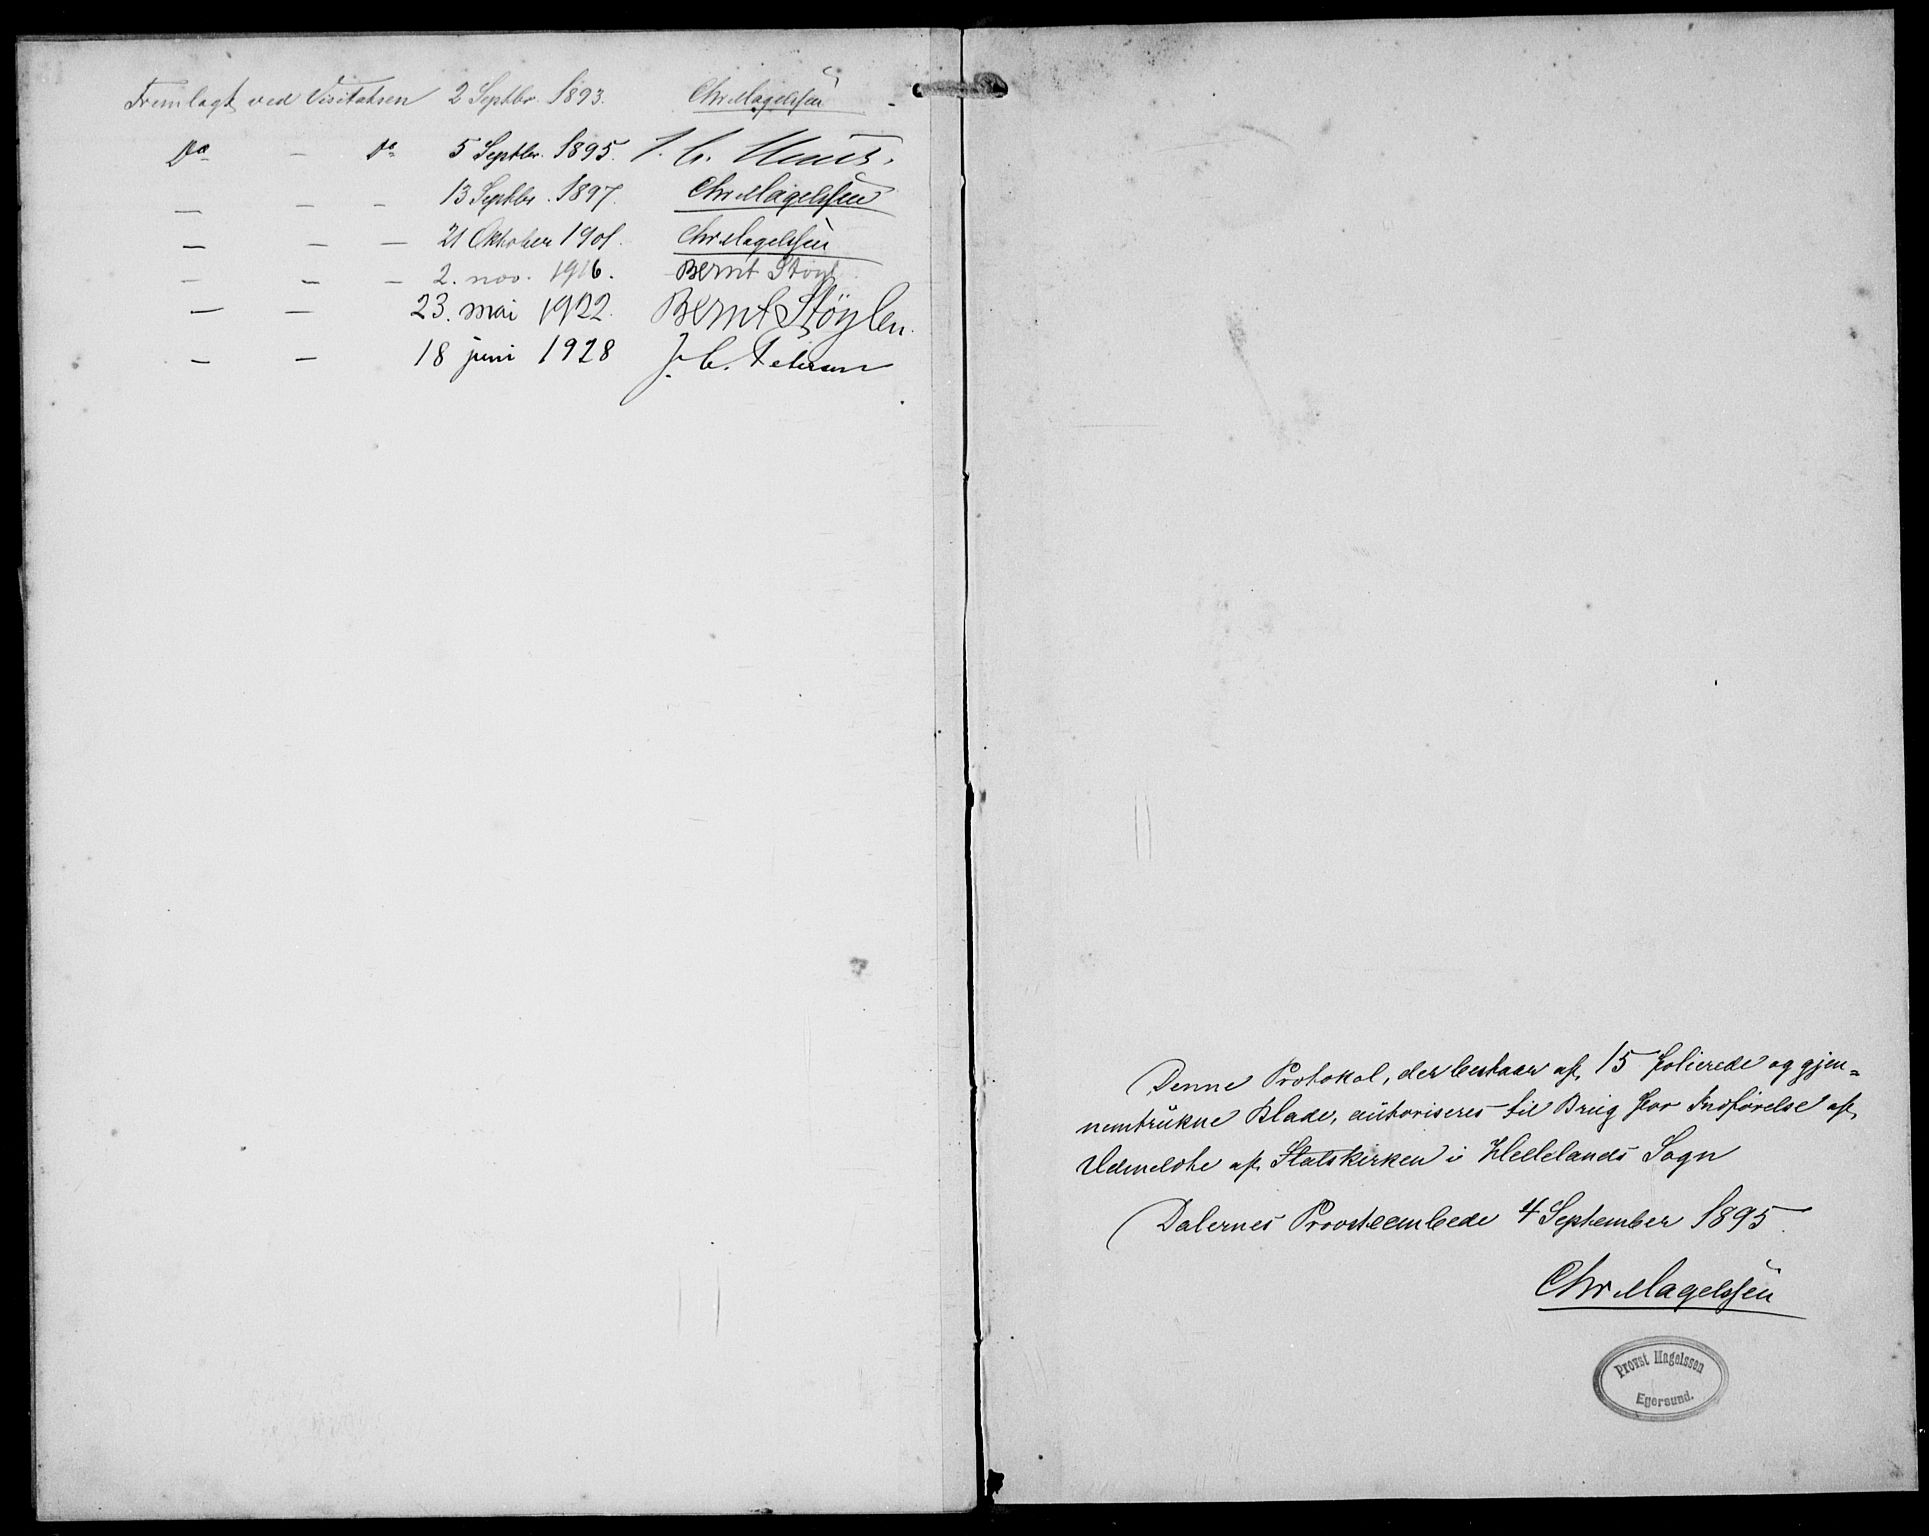 SAST, Helleland sokneprestkontor, Ministerialbok nr. A 10, 1892-1929, s. 12